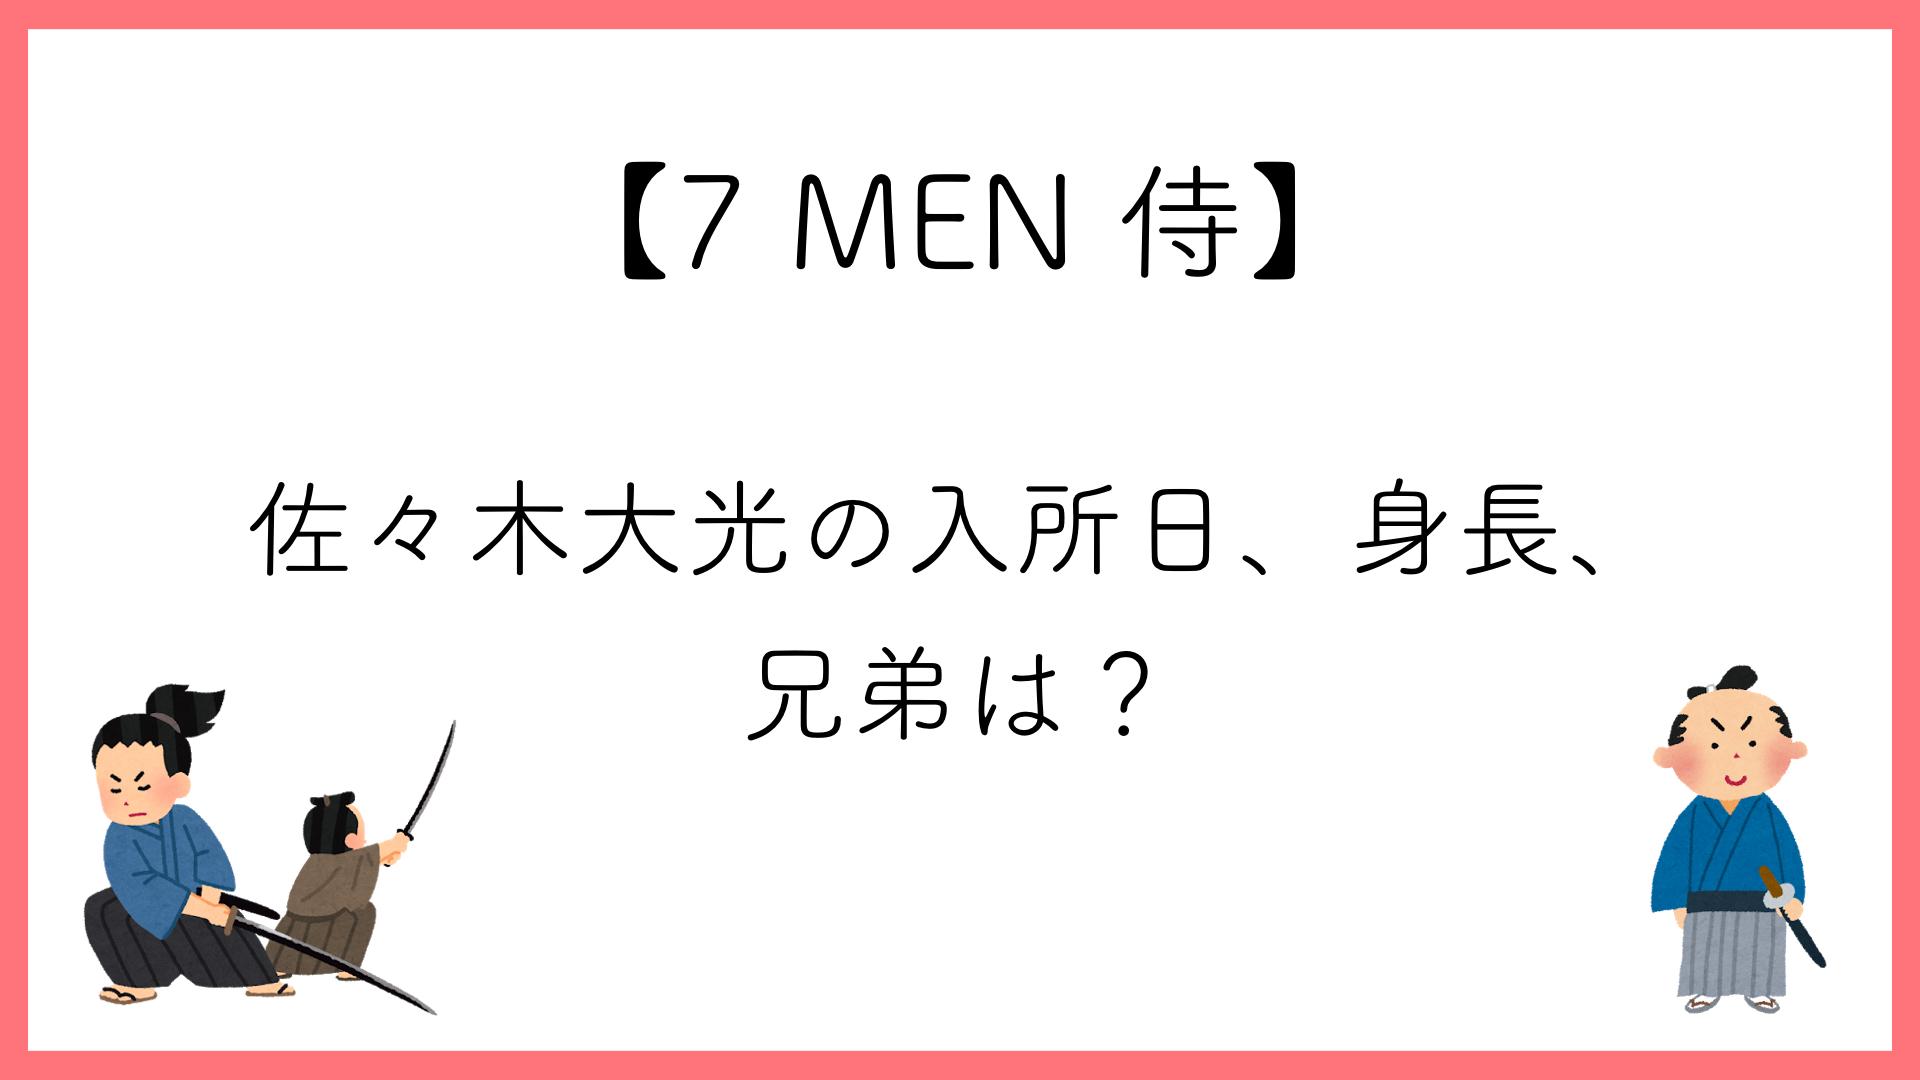 【7 MEN 侍】佐々木大光の入所日、身長、兄弟は?